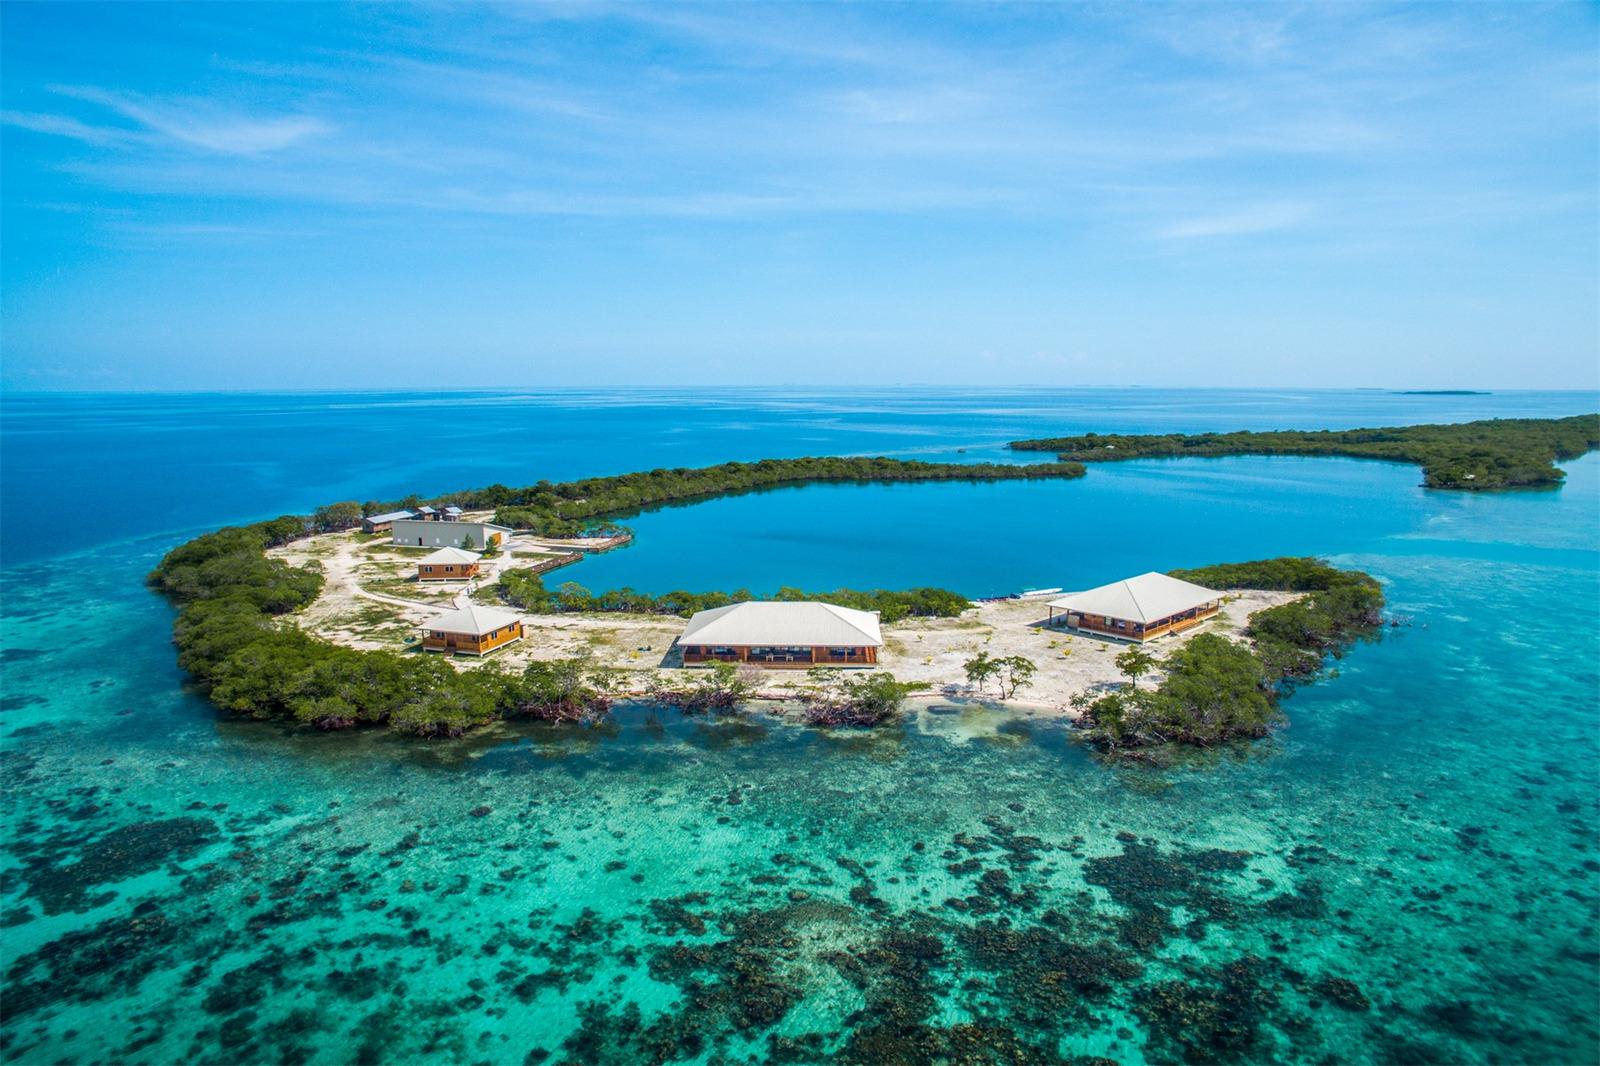 Privat island